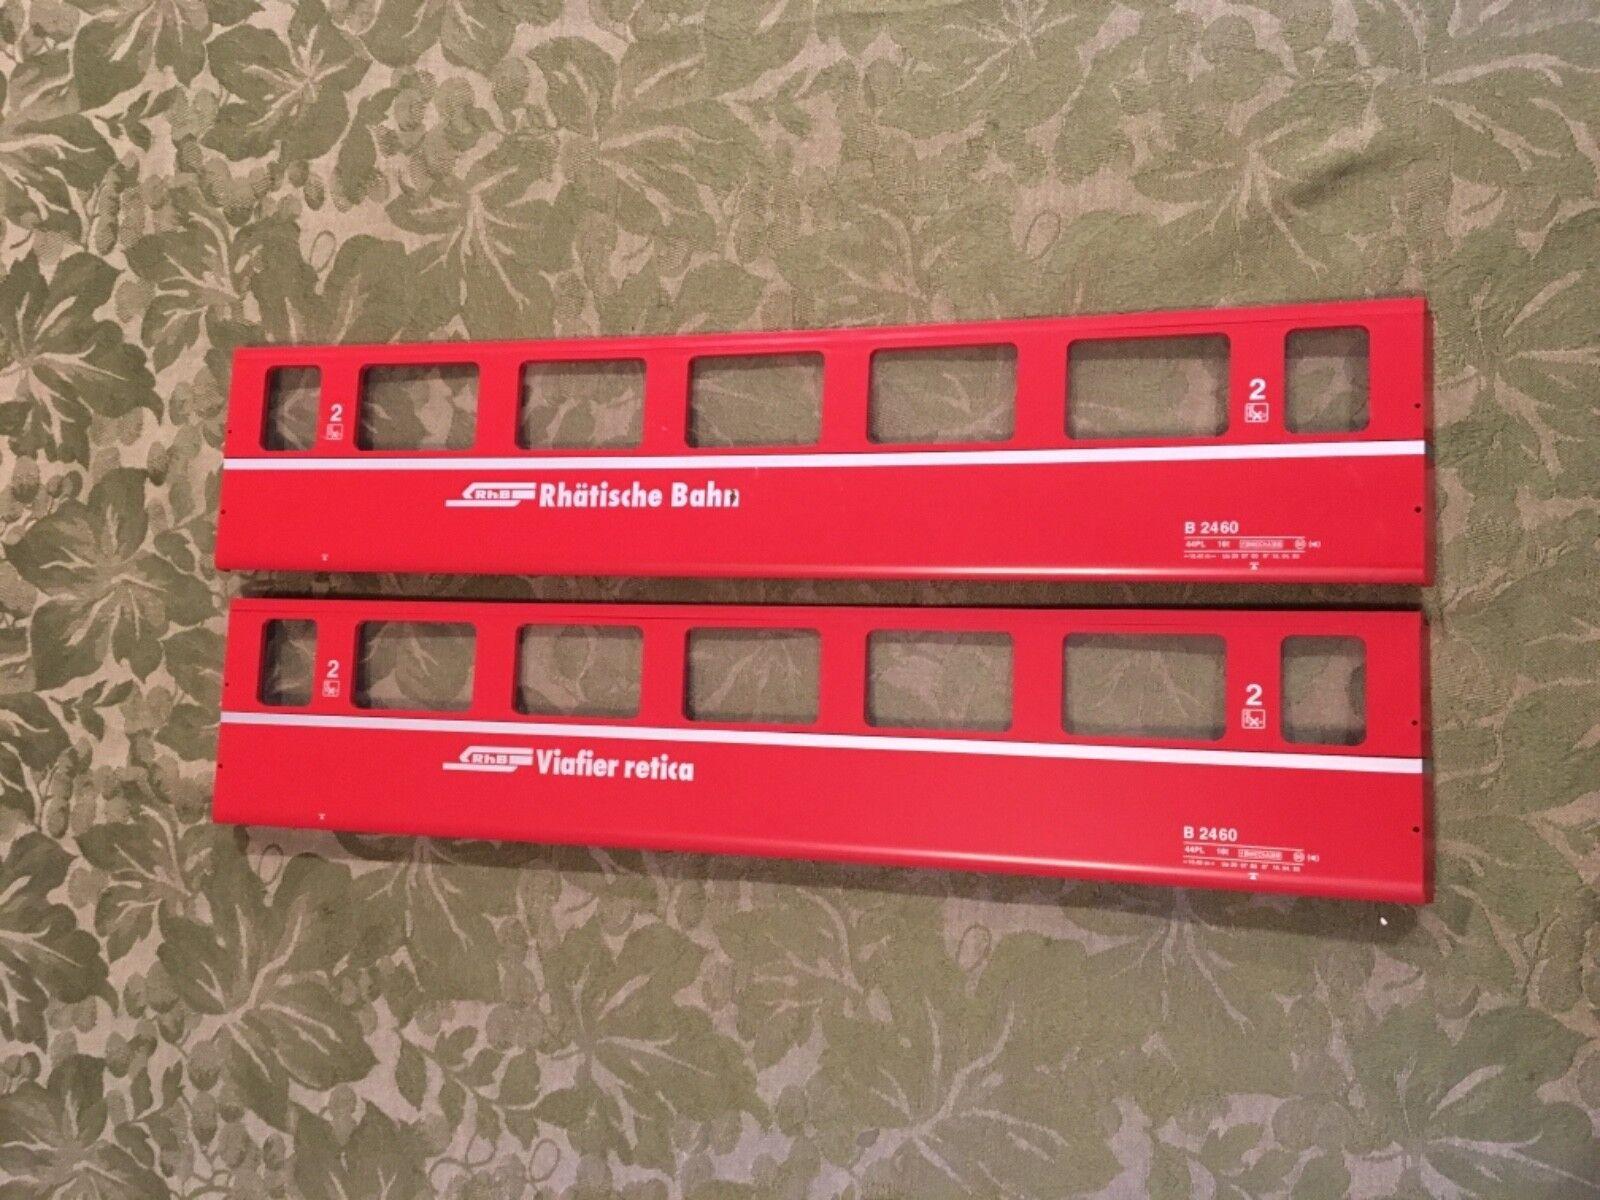 2 Rare LGB RHB Swiss 3067 series Passenger Car Replcement Side Panels & Windows